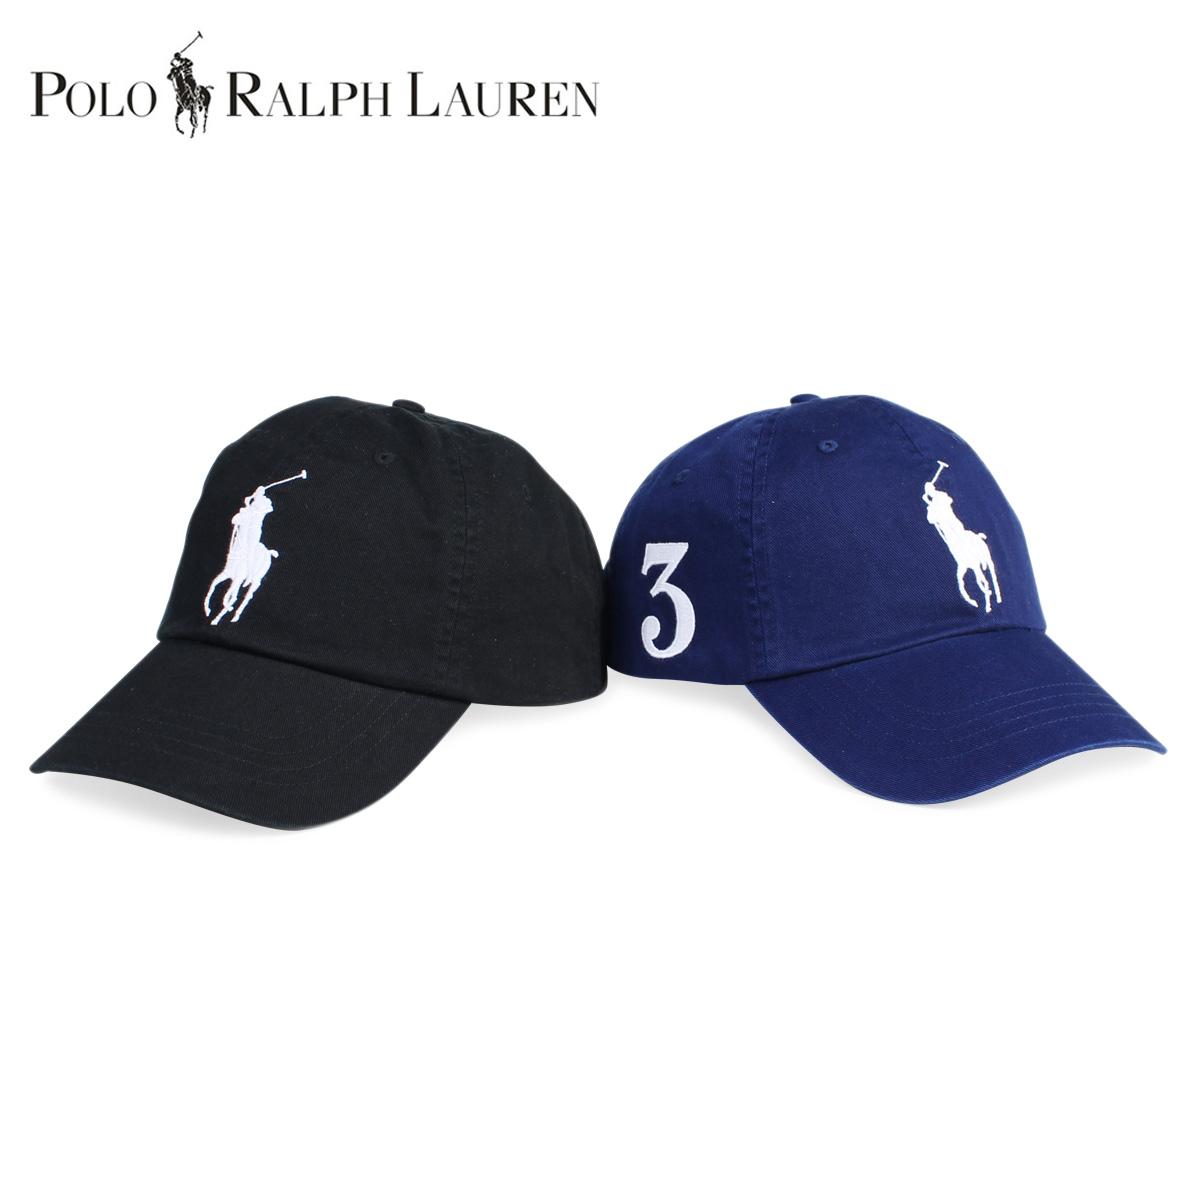 Ralph Lauren cap hat men gap Dis snapback cap POLO RALPH LAUREN polo big  pony 2 color  7 27 Shinnyu load  470ae3bafc9